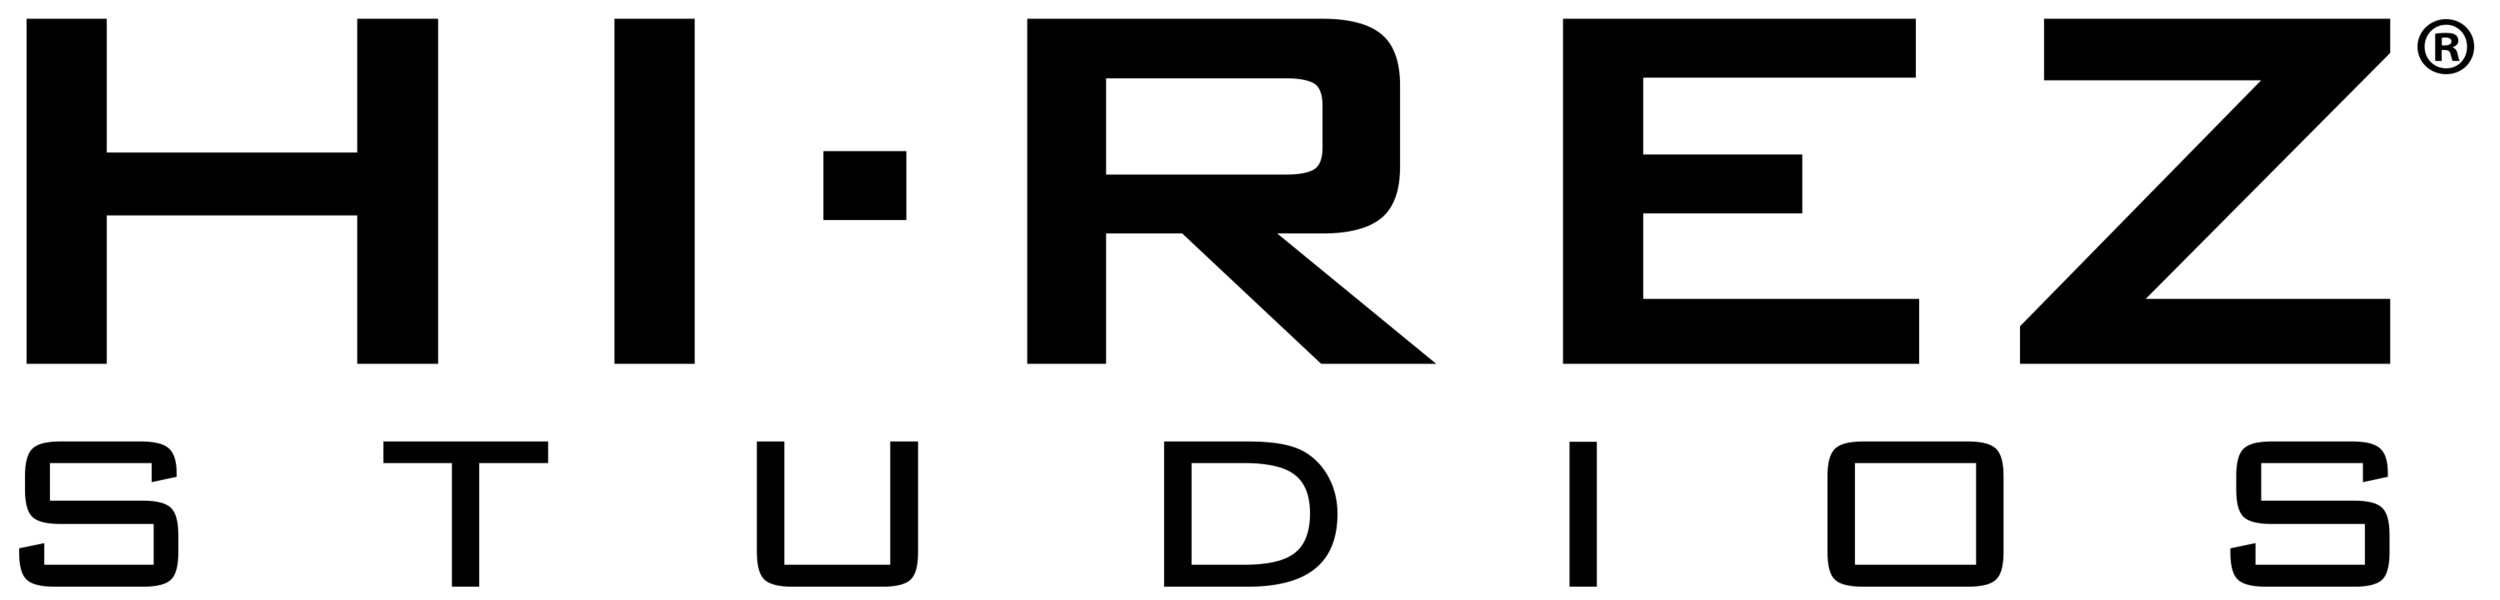 Hi-Rez_Logo_Black.png